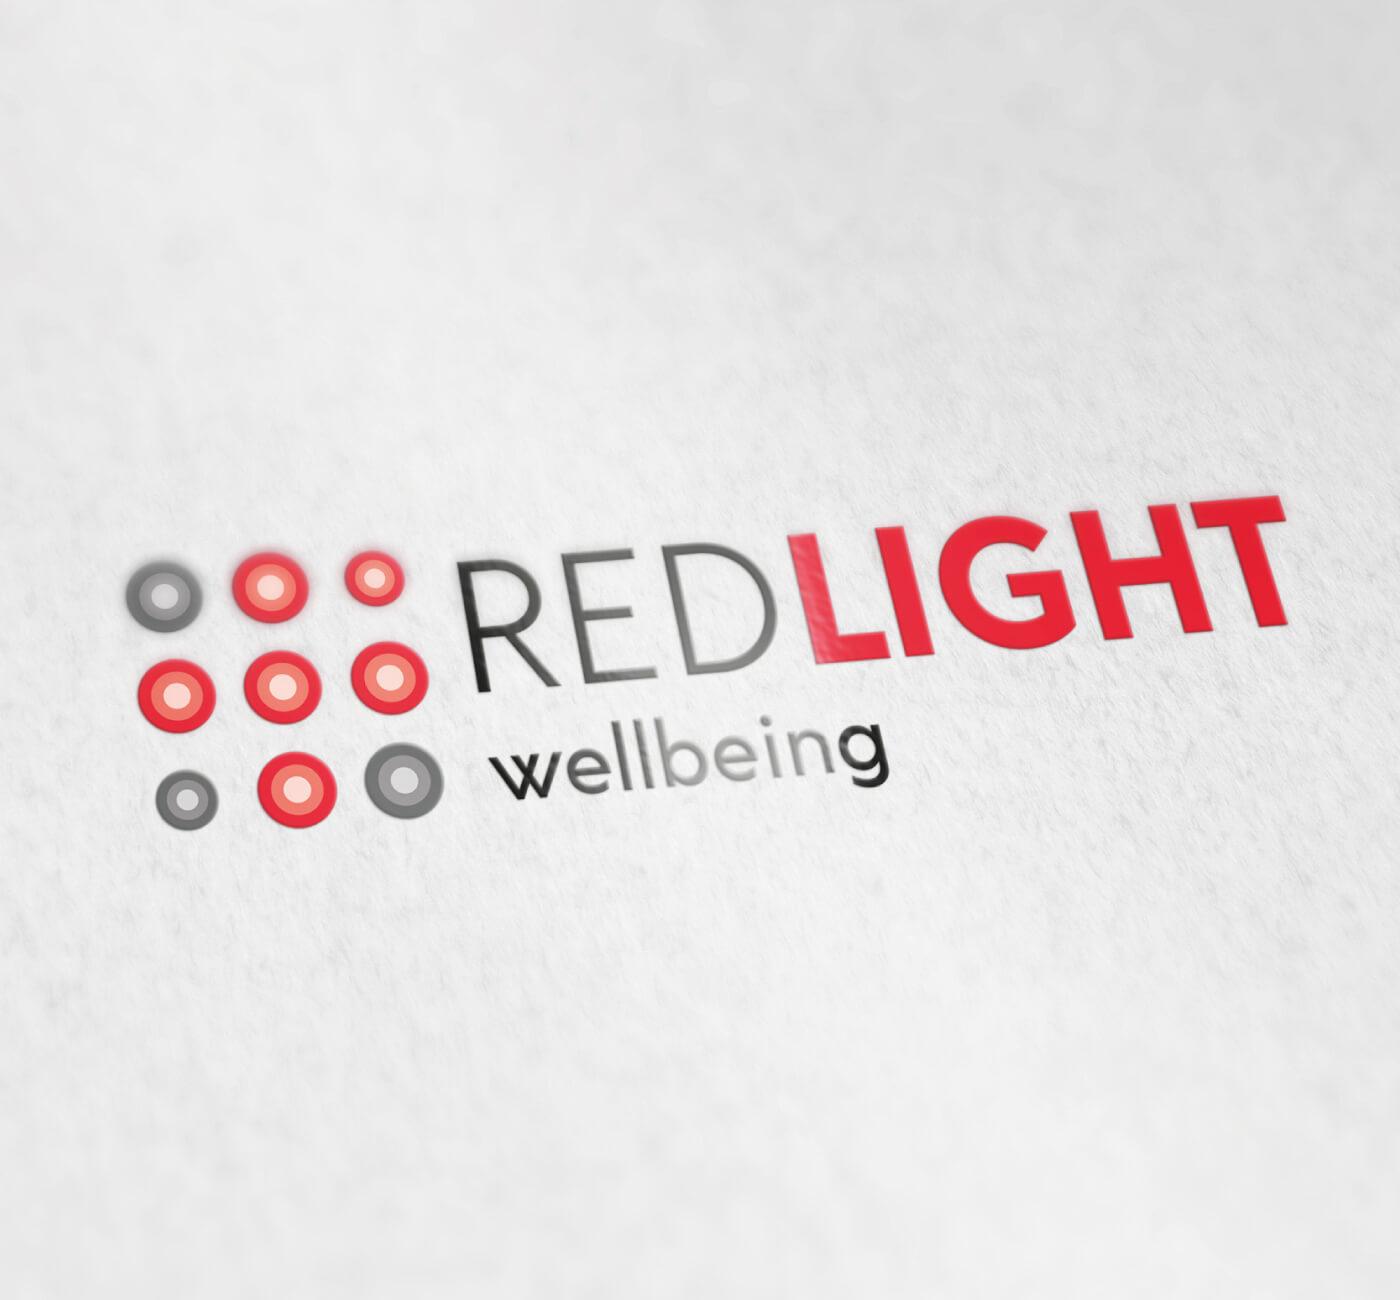 red light wellbeing logo